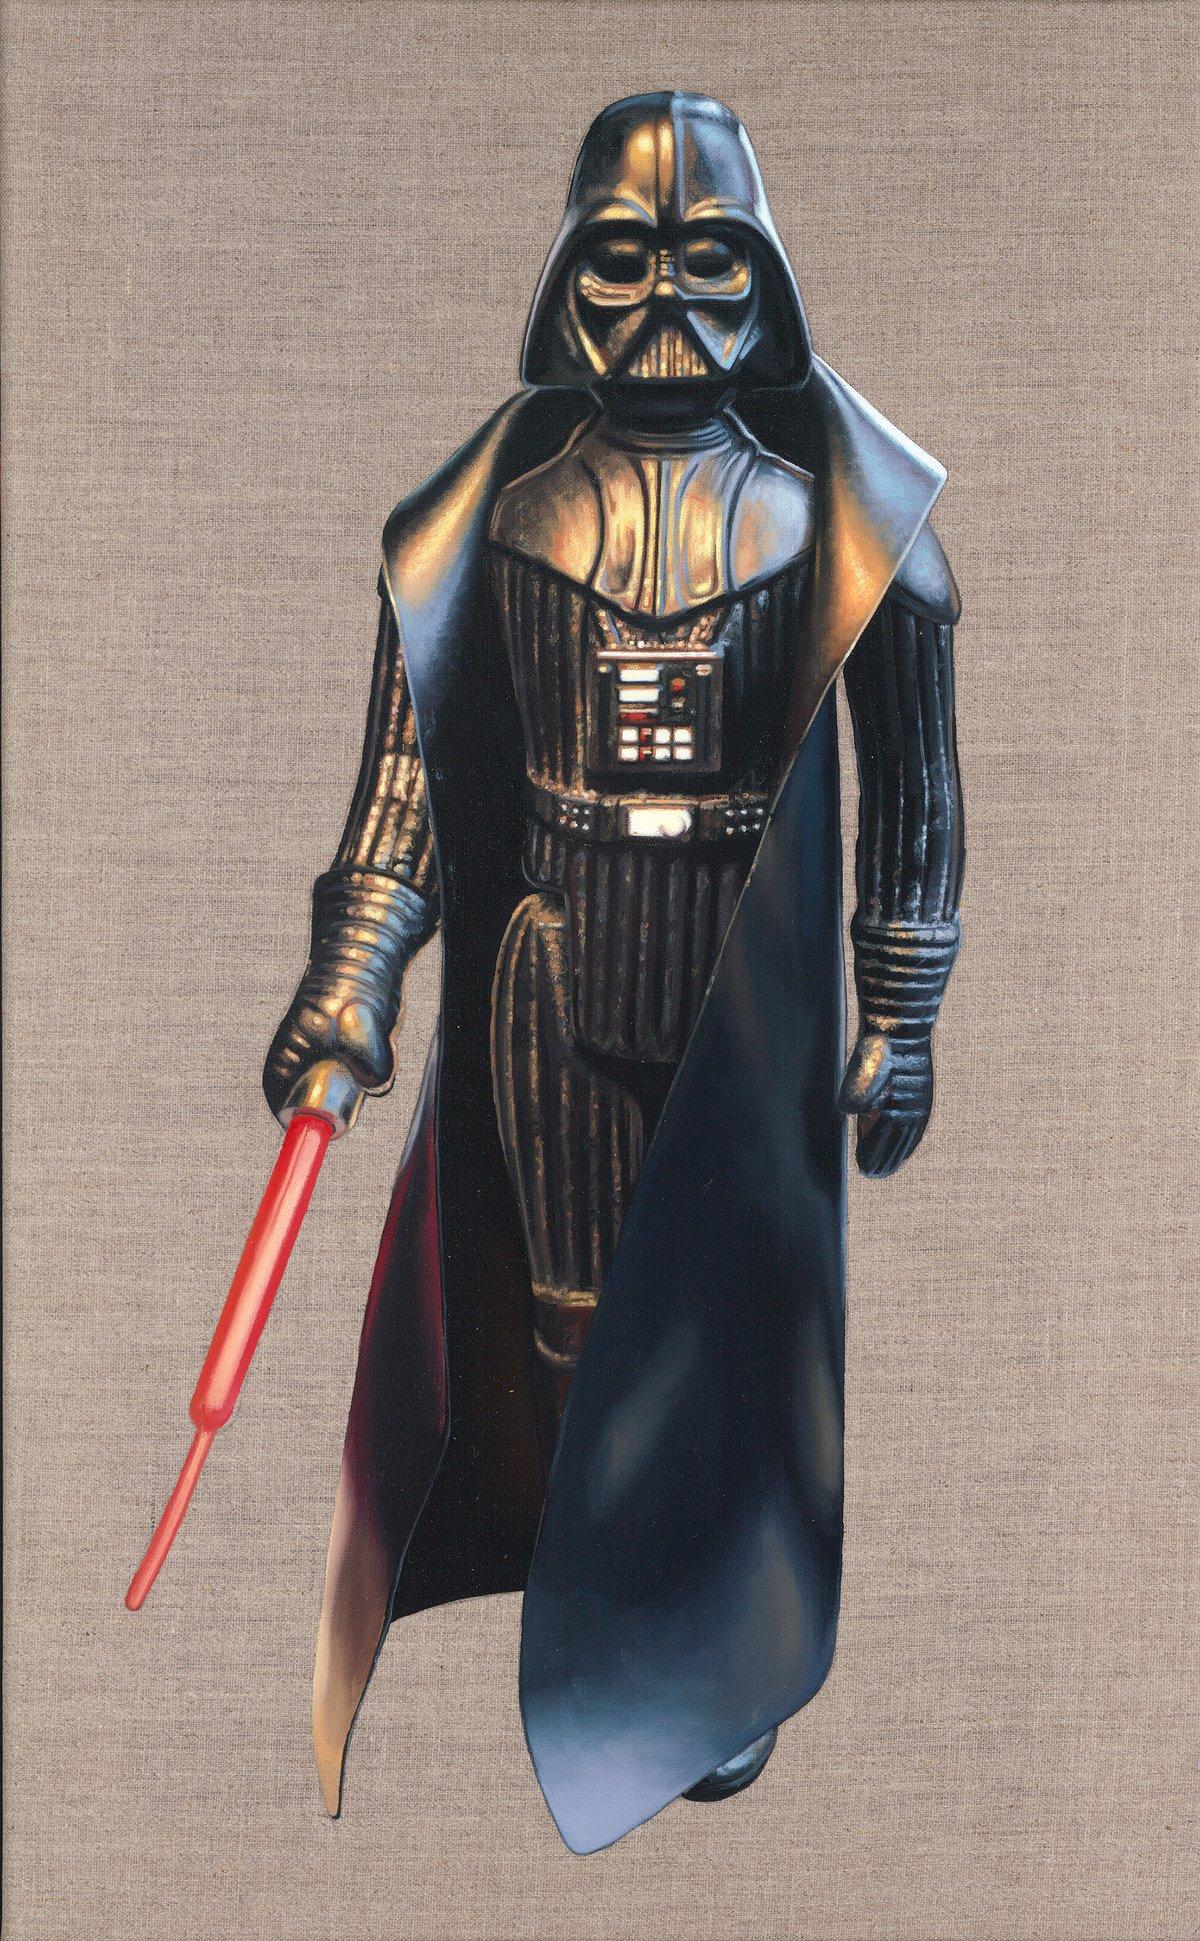 Darth Vader // Original Oil Painting